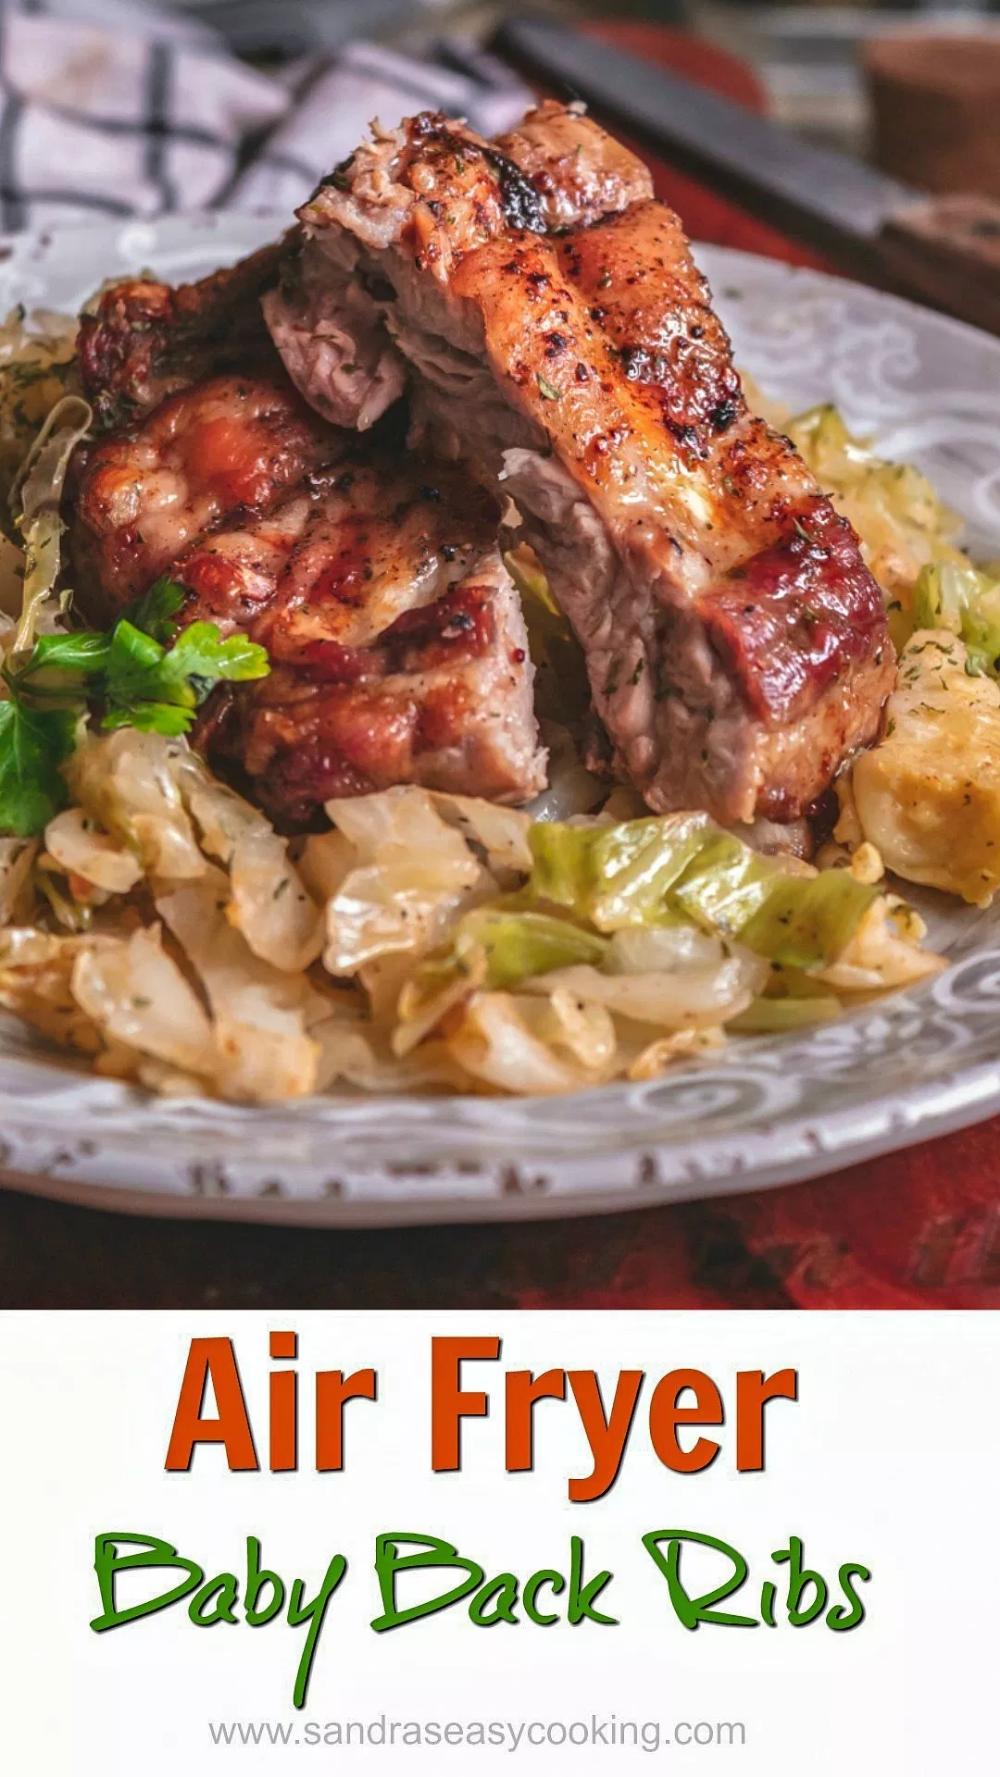 Air Fryer Baby Back Ribs Recipe Recipes, Air fryer